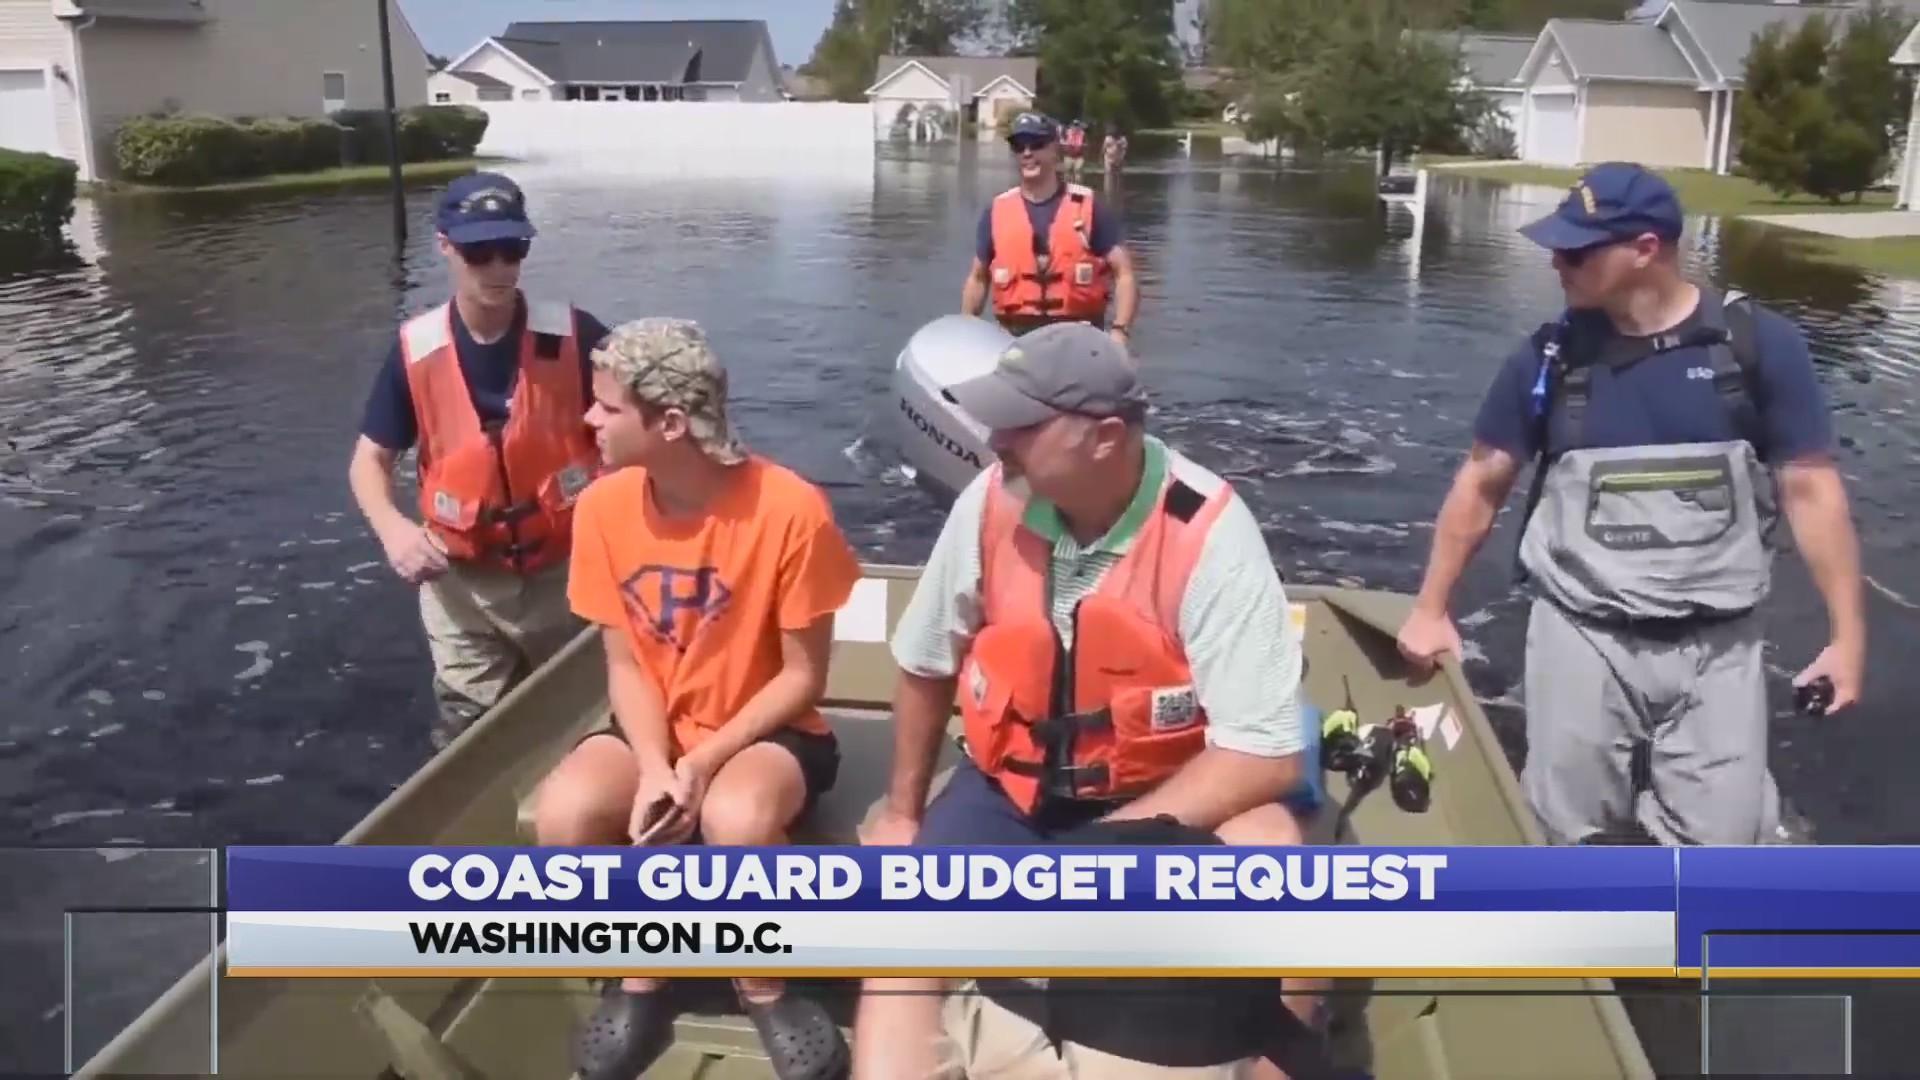 Capito_coast_guard_budget_request_0_20190327213317